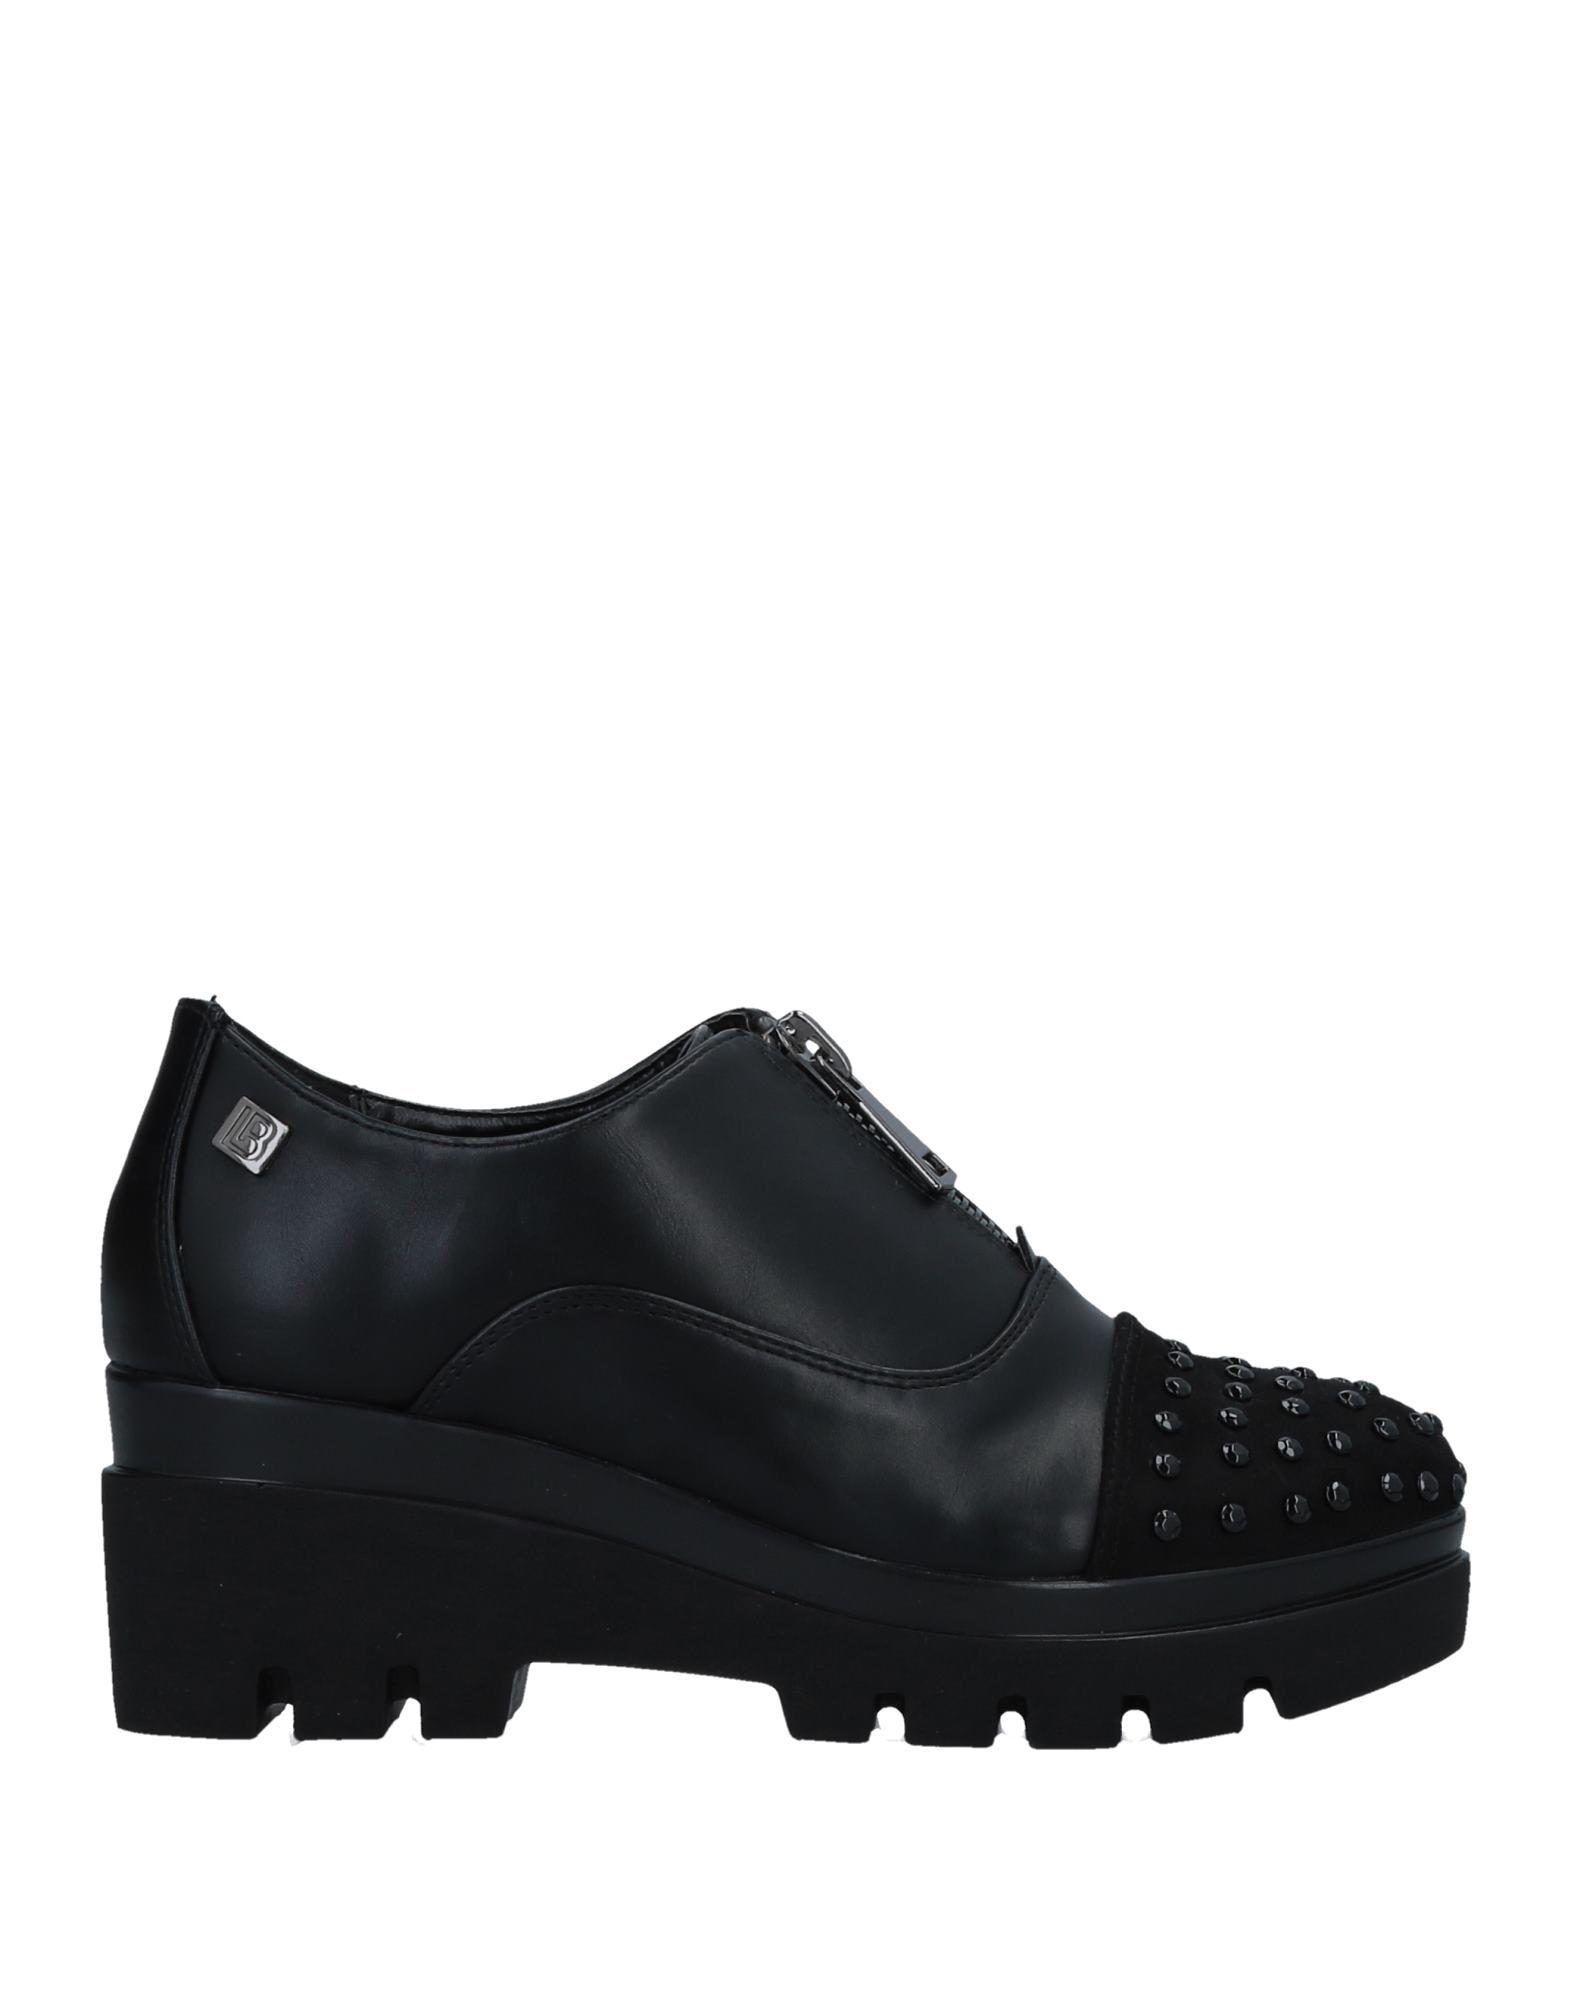 Laura Biagiotti Gute Mokassins Damen  11505756MQ Gute Biagiotti Qualität beliebte Schuhe ce83b2